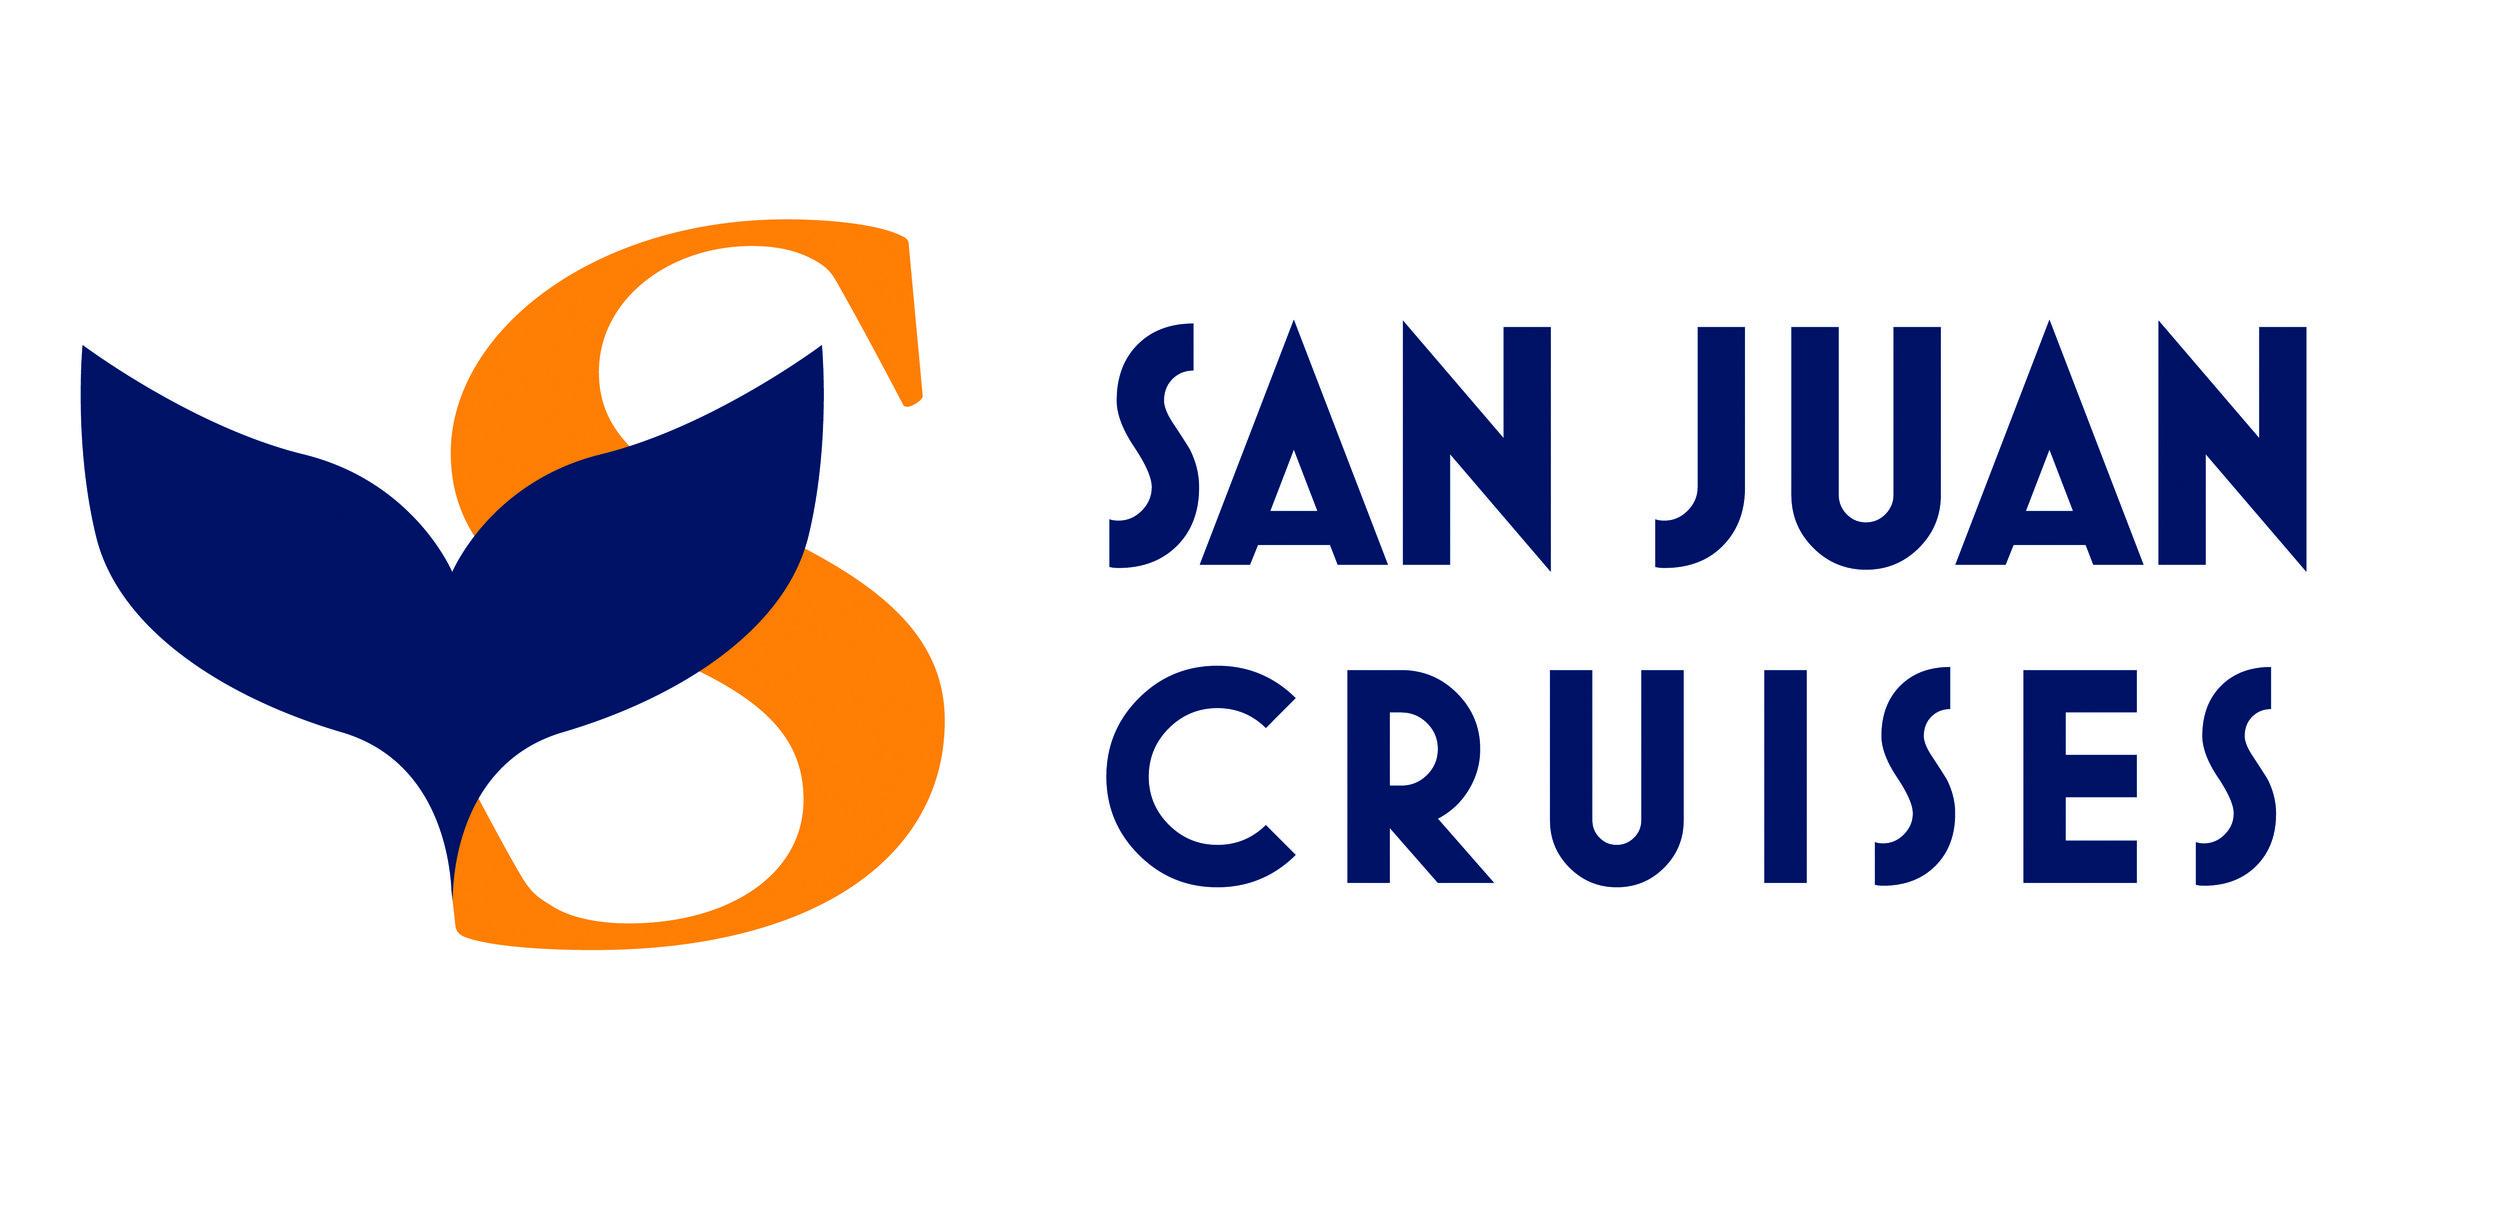 SanJuanCruises-logo-CMYK.jpg